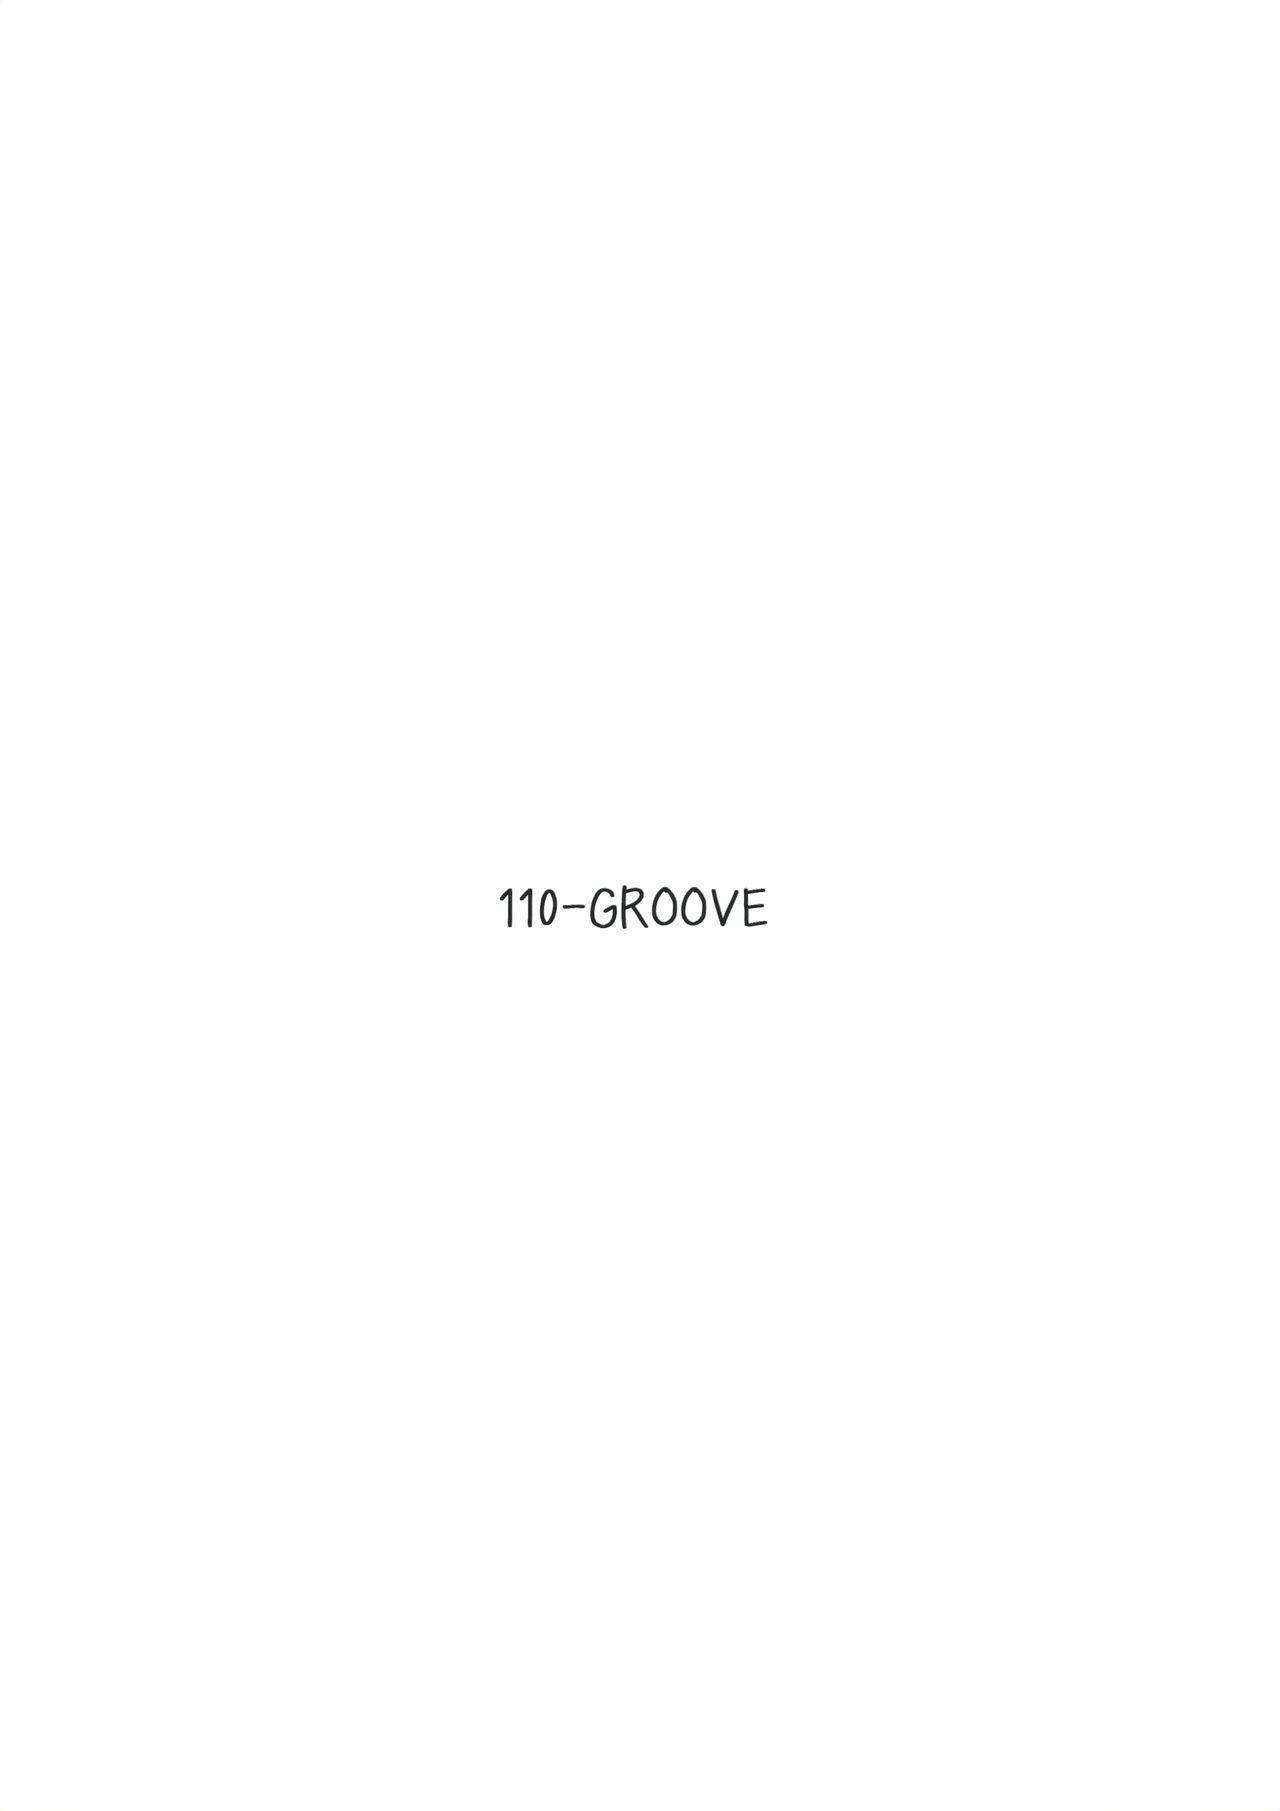 (C91) [110-GROOVE (Itou Yuuji)] Otoshigoro no Reimu-san to Marisa-san (Touhou Project) [Chinese] [冴月麟个人汉化] 21